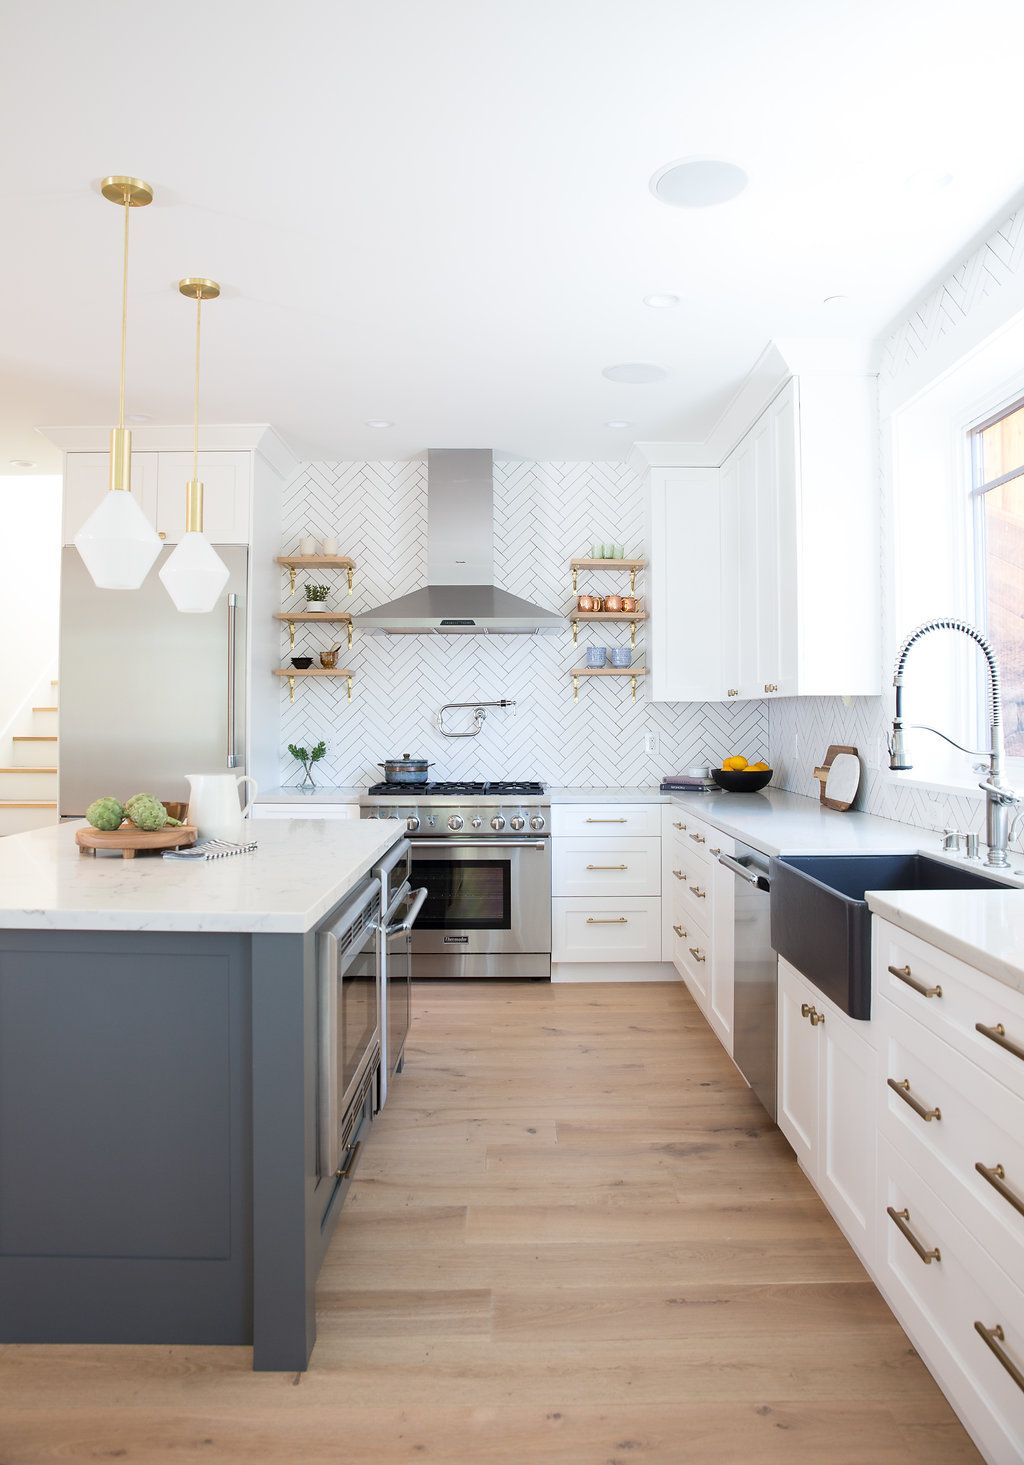 Interior Design Love Interiors In 2020 Kitchen Inspiration Design Kitchen Design Home Decor Kitchen